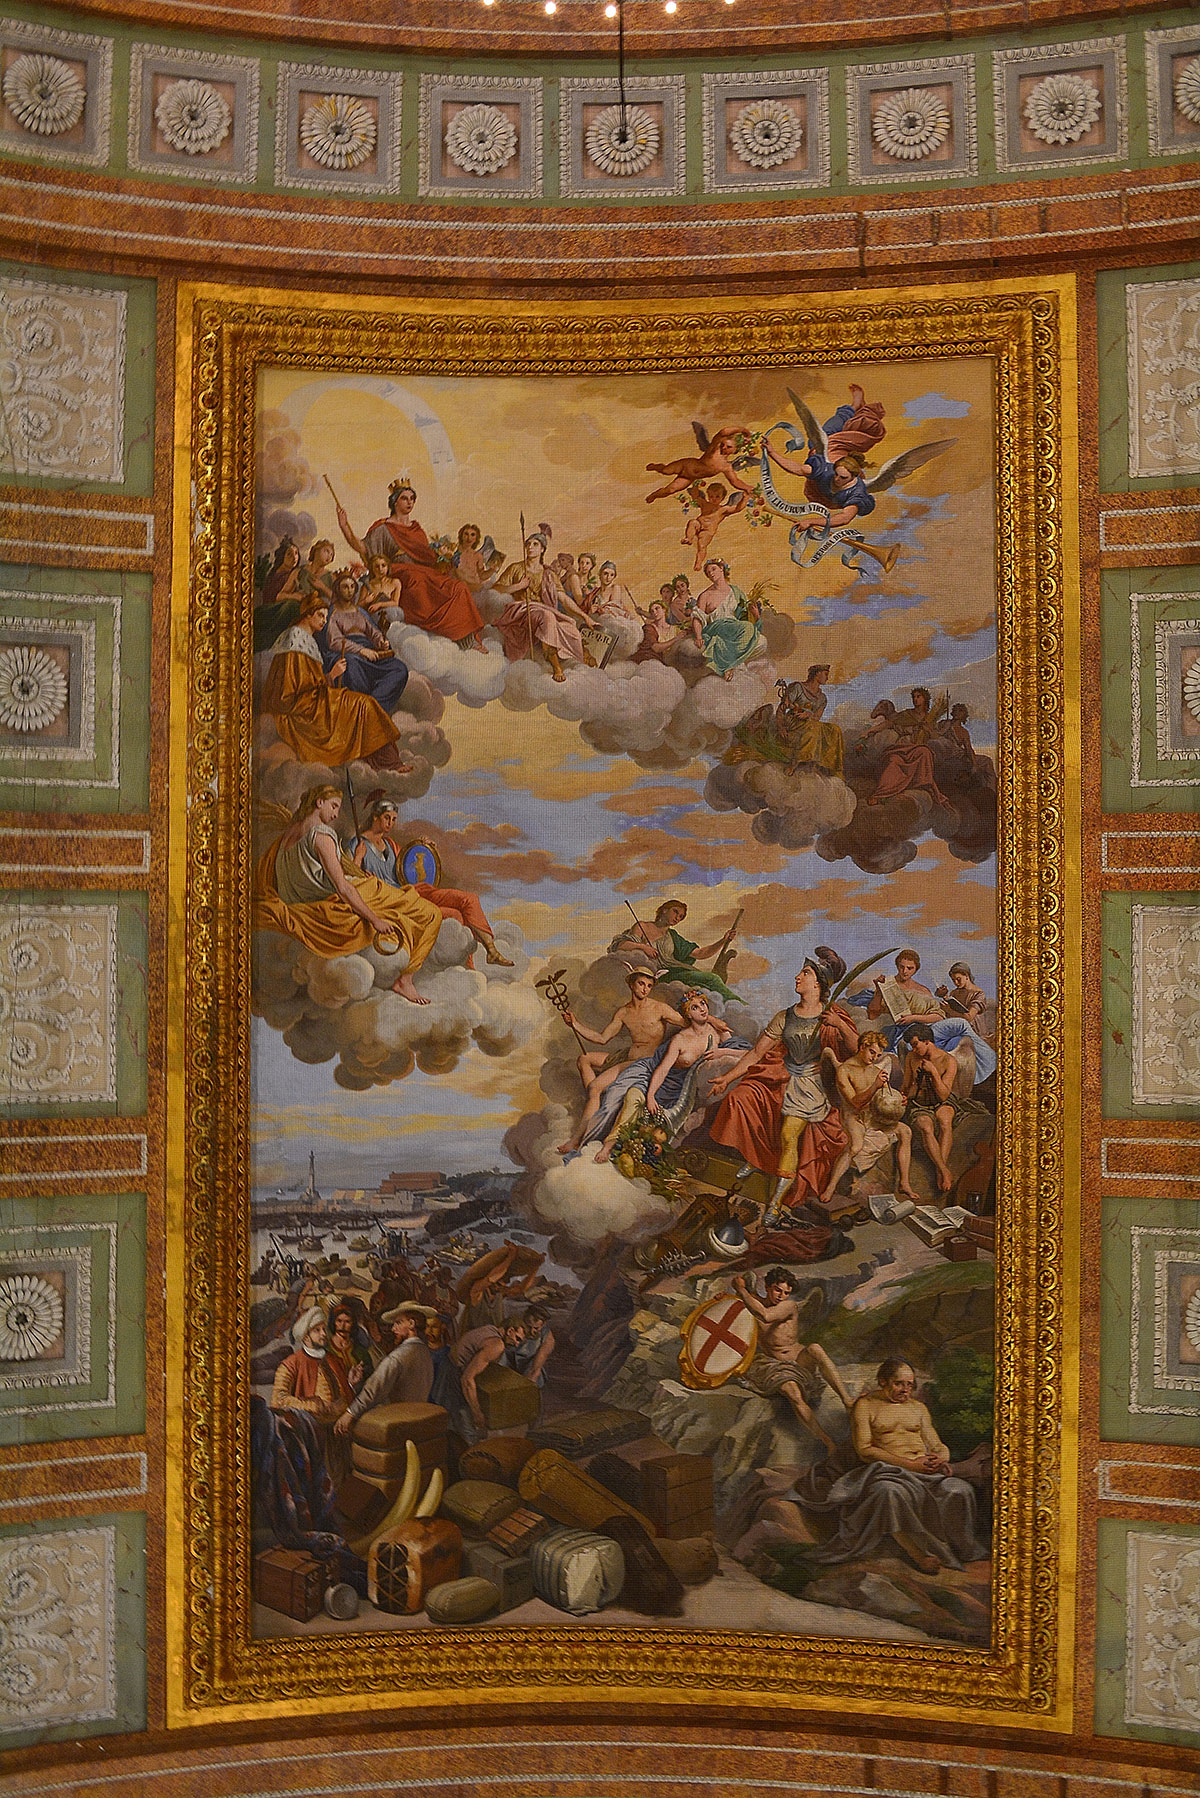 The Ligurians trade /Il commercio dei Liguri/ + Isola, Giuseppe *magnifico